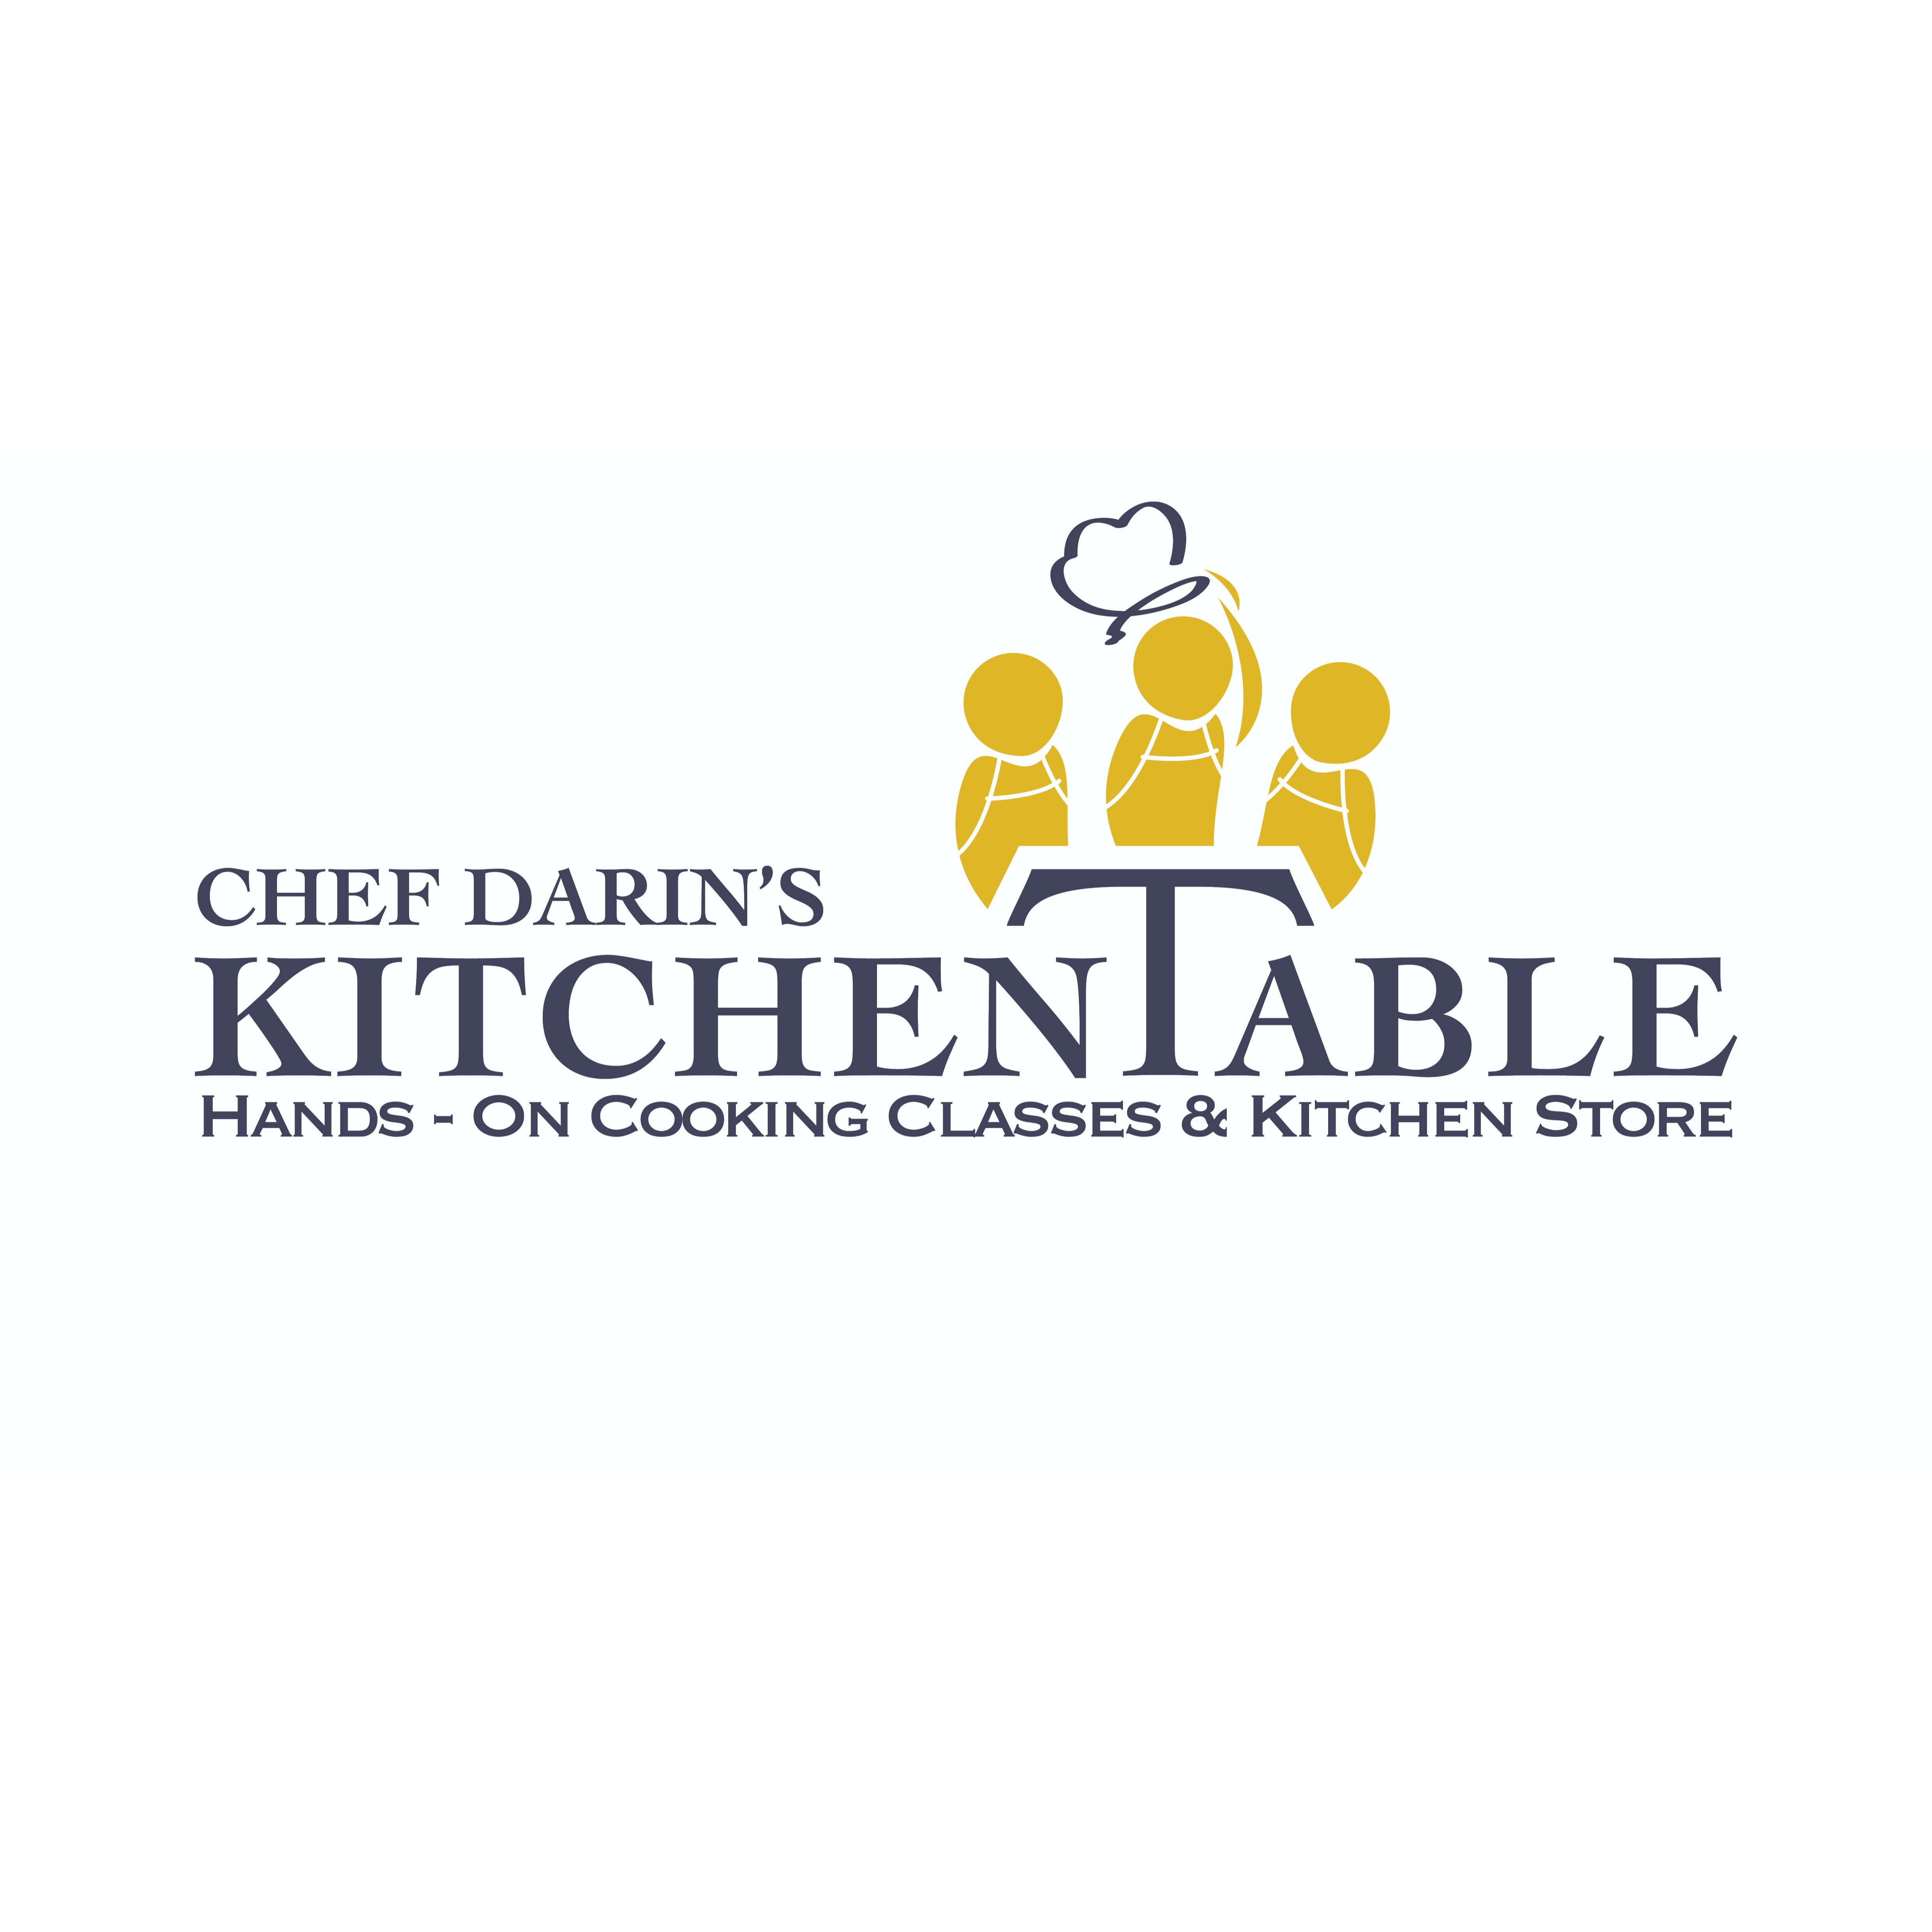 Chef Darin's Kitchen Table